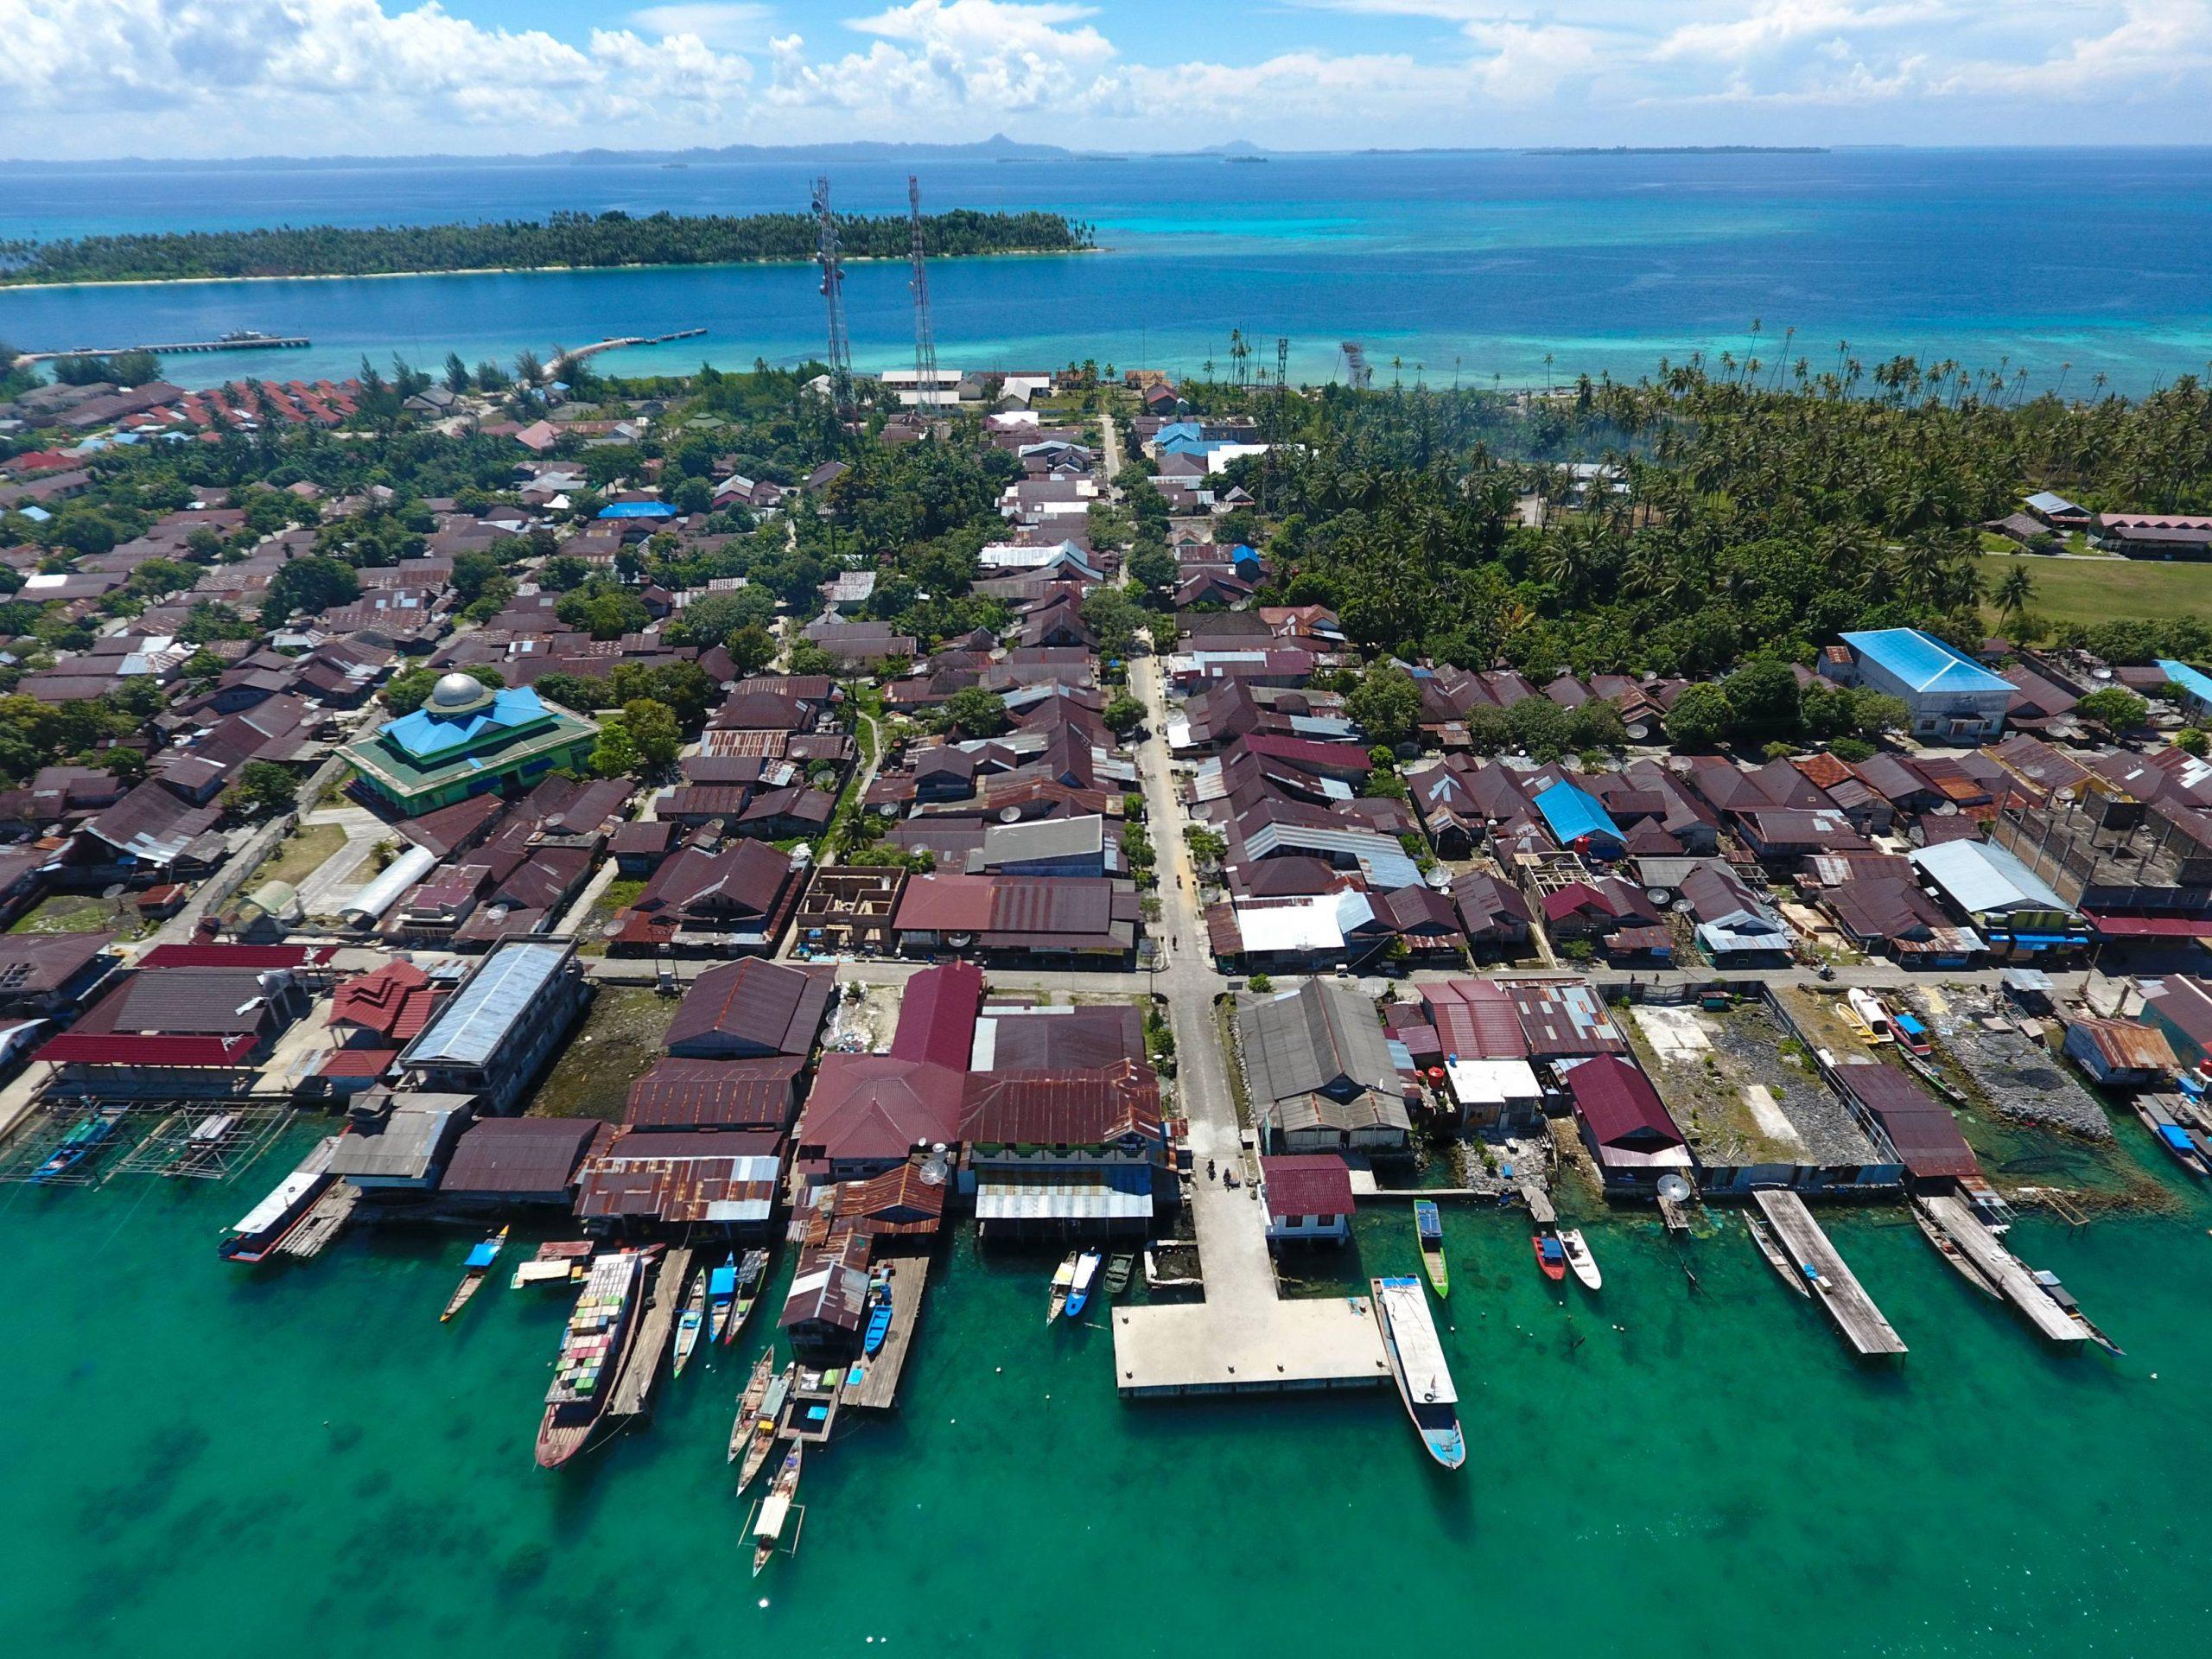 Pulau Balai, Singkil